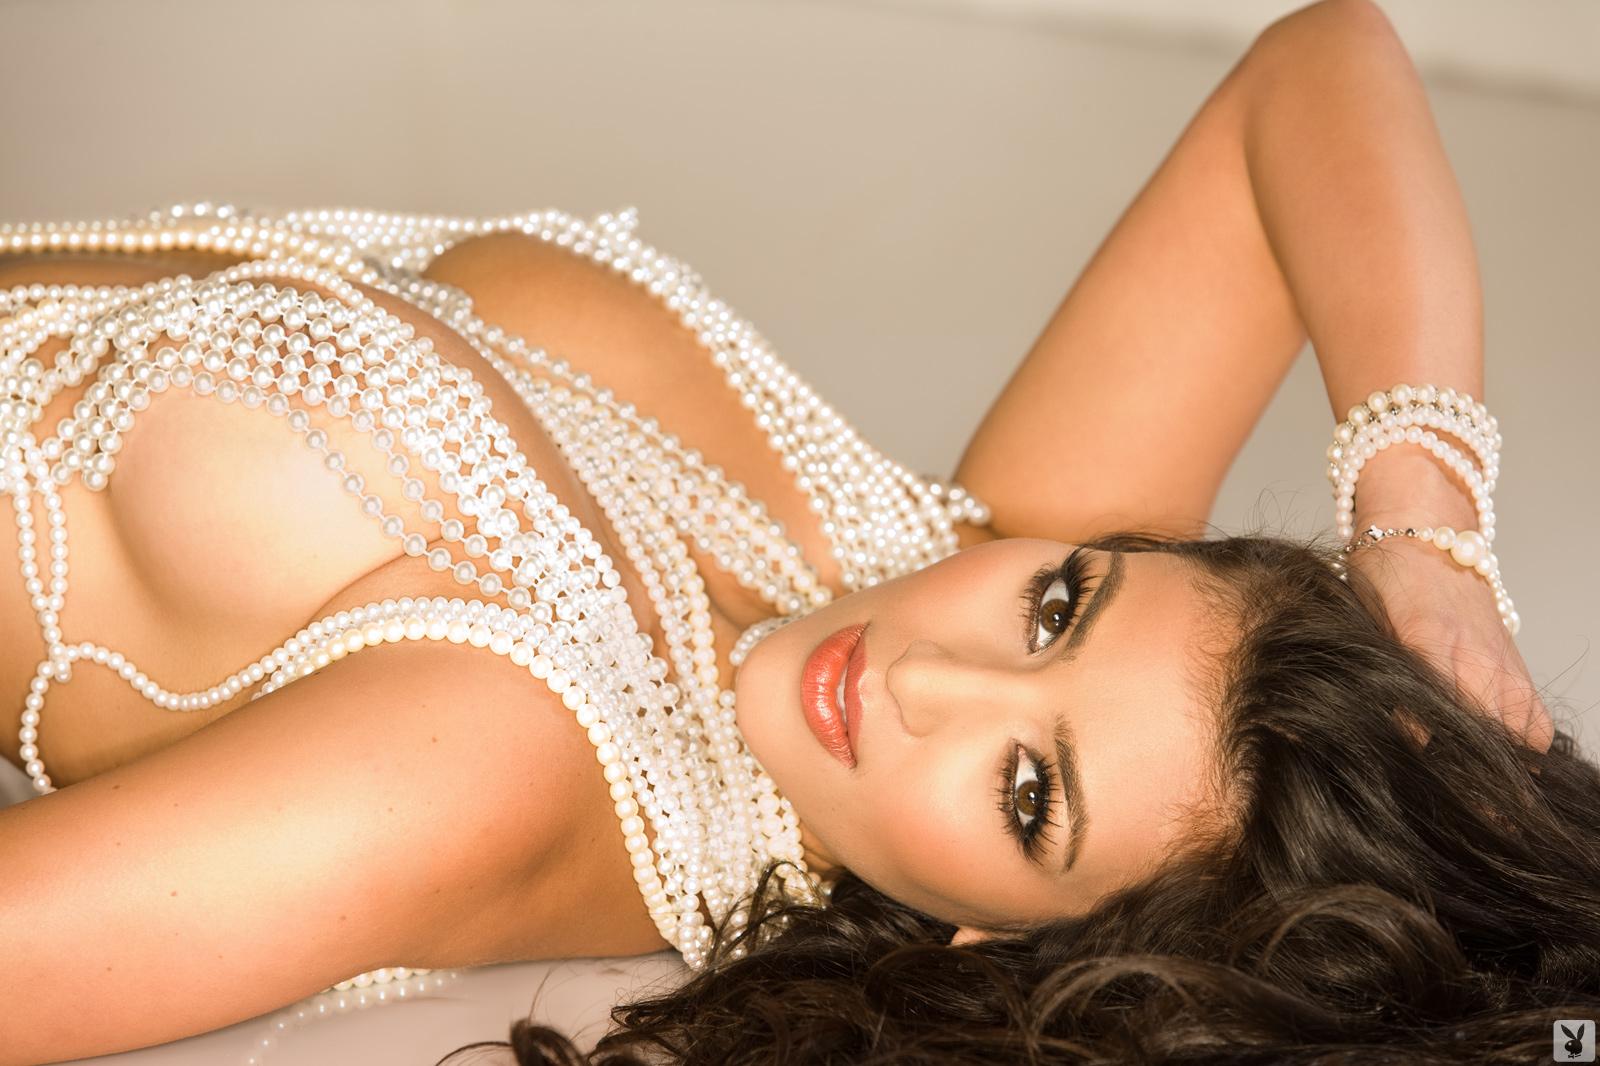 http://2.bp.blogspot.com/-IXGWcZlQ-cU/Tm0CgRl1Y1I/AAAAAAAACgA/c-YU-E93k0g/s1600/kim-kardashian-body-2011.jpg